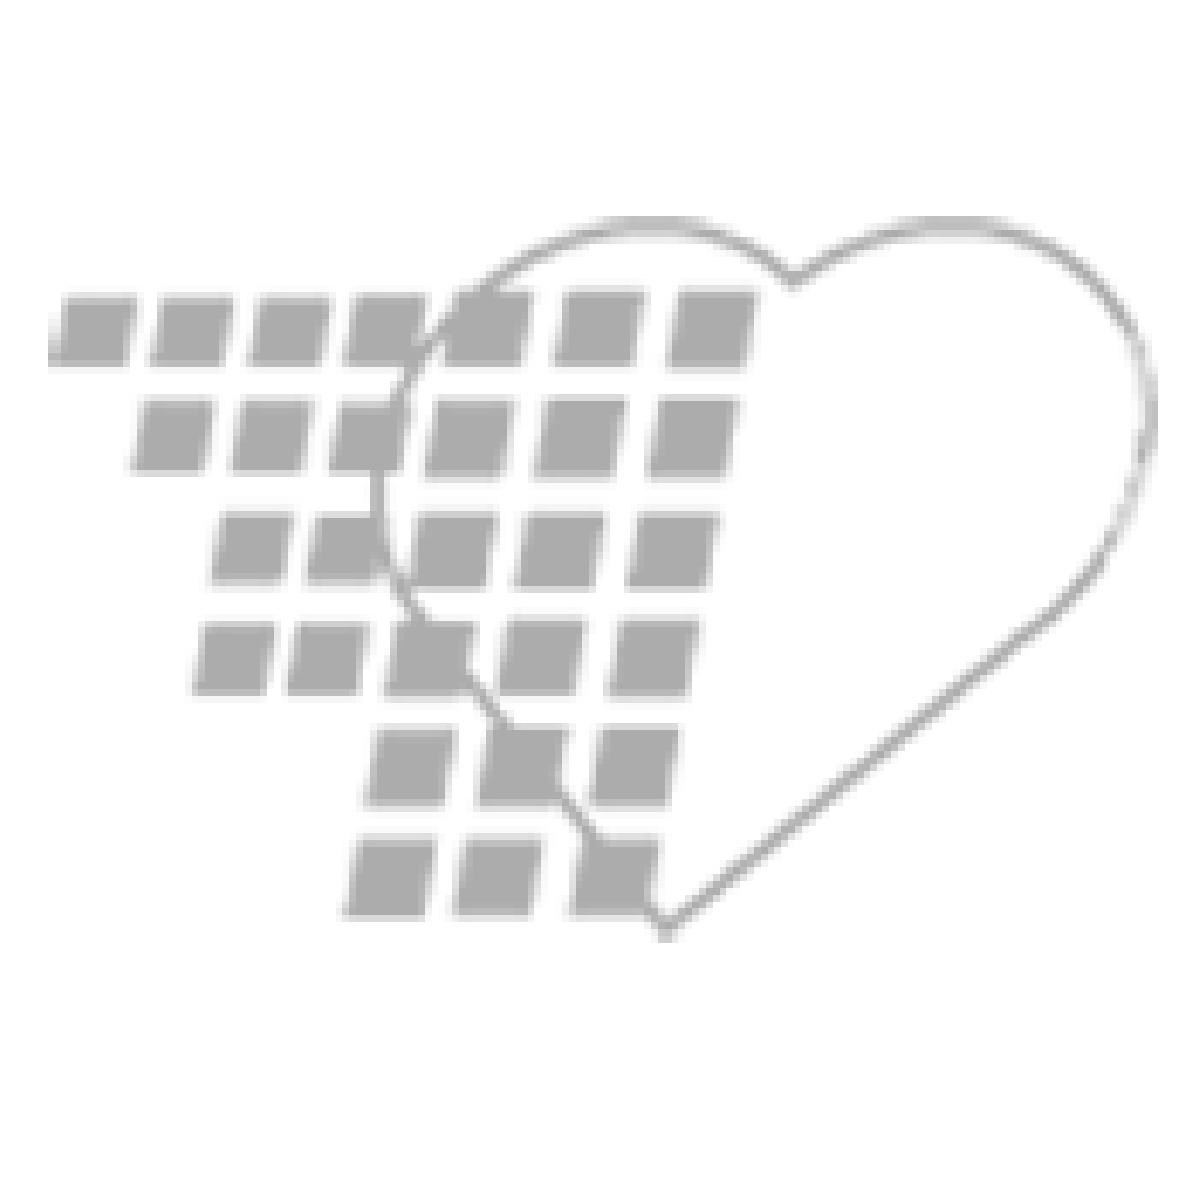 01-12-5000-GRN - Iron Duck® CORE O2 Master Case - Green